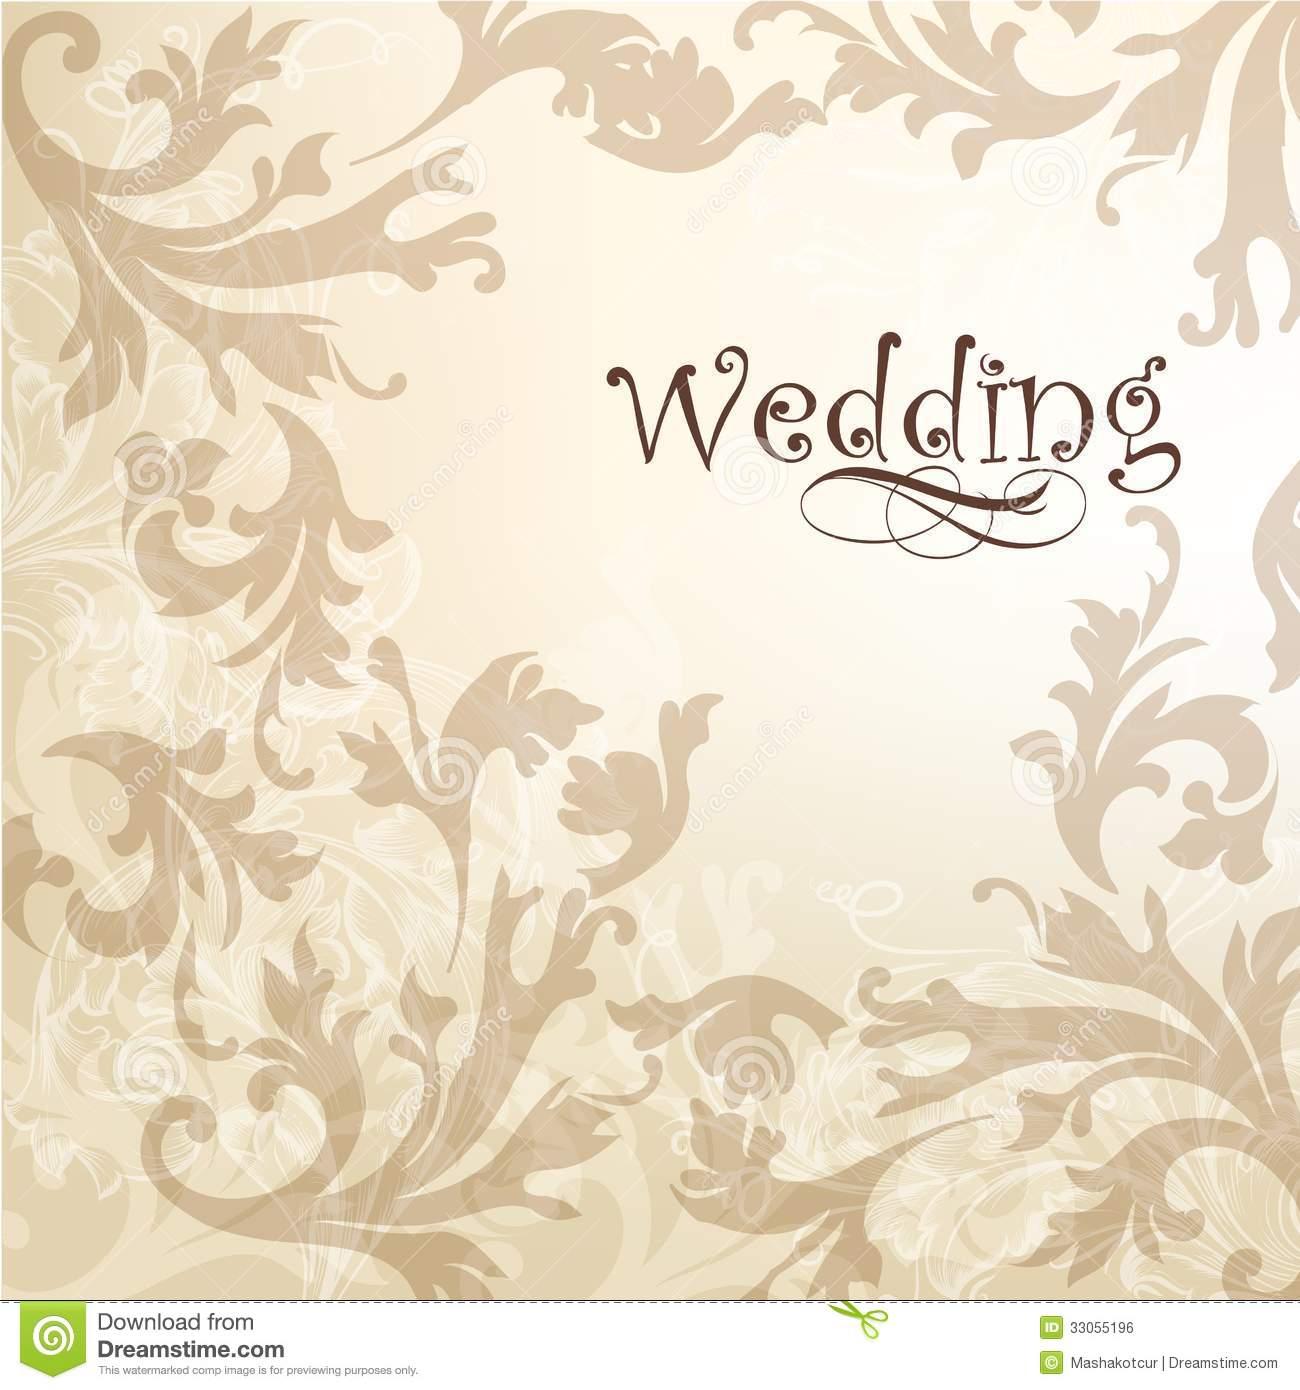 Wedding Picture Background Design